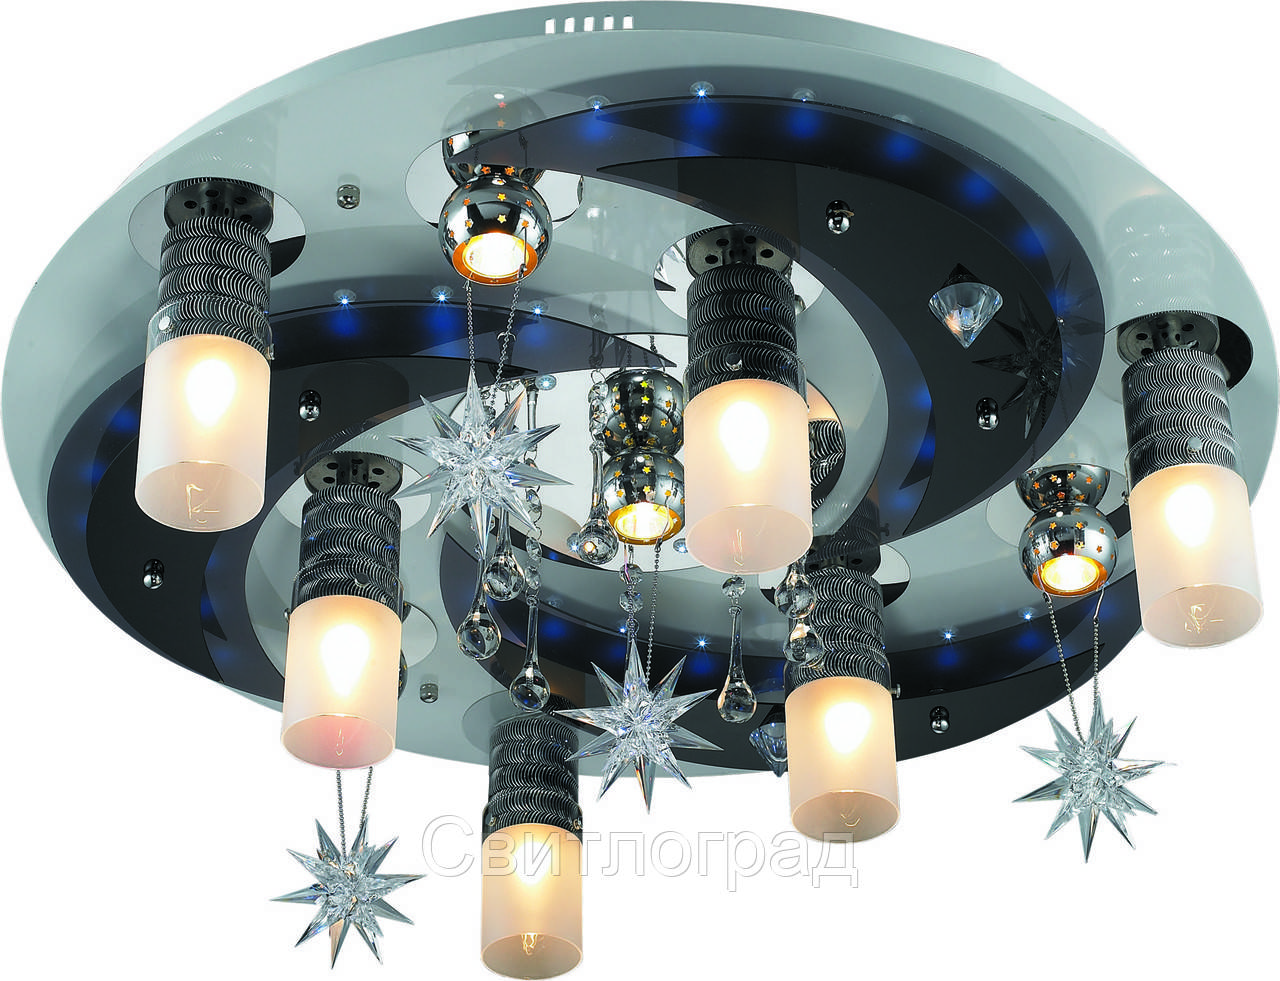 Светильник Потолочный с Led Подсветкой  с Плафонами  Altalusse LV171-10 White & Chrome